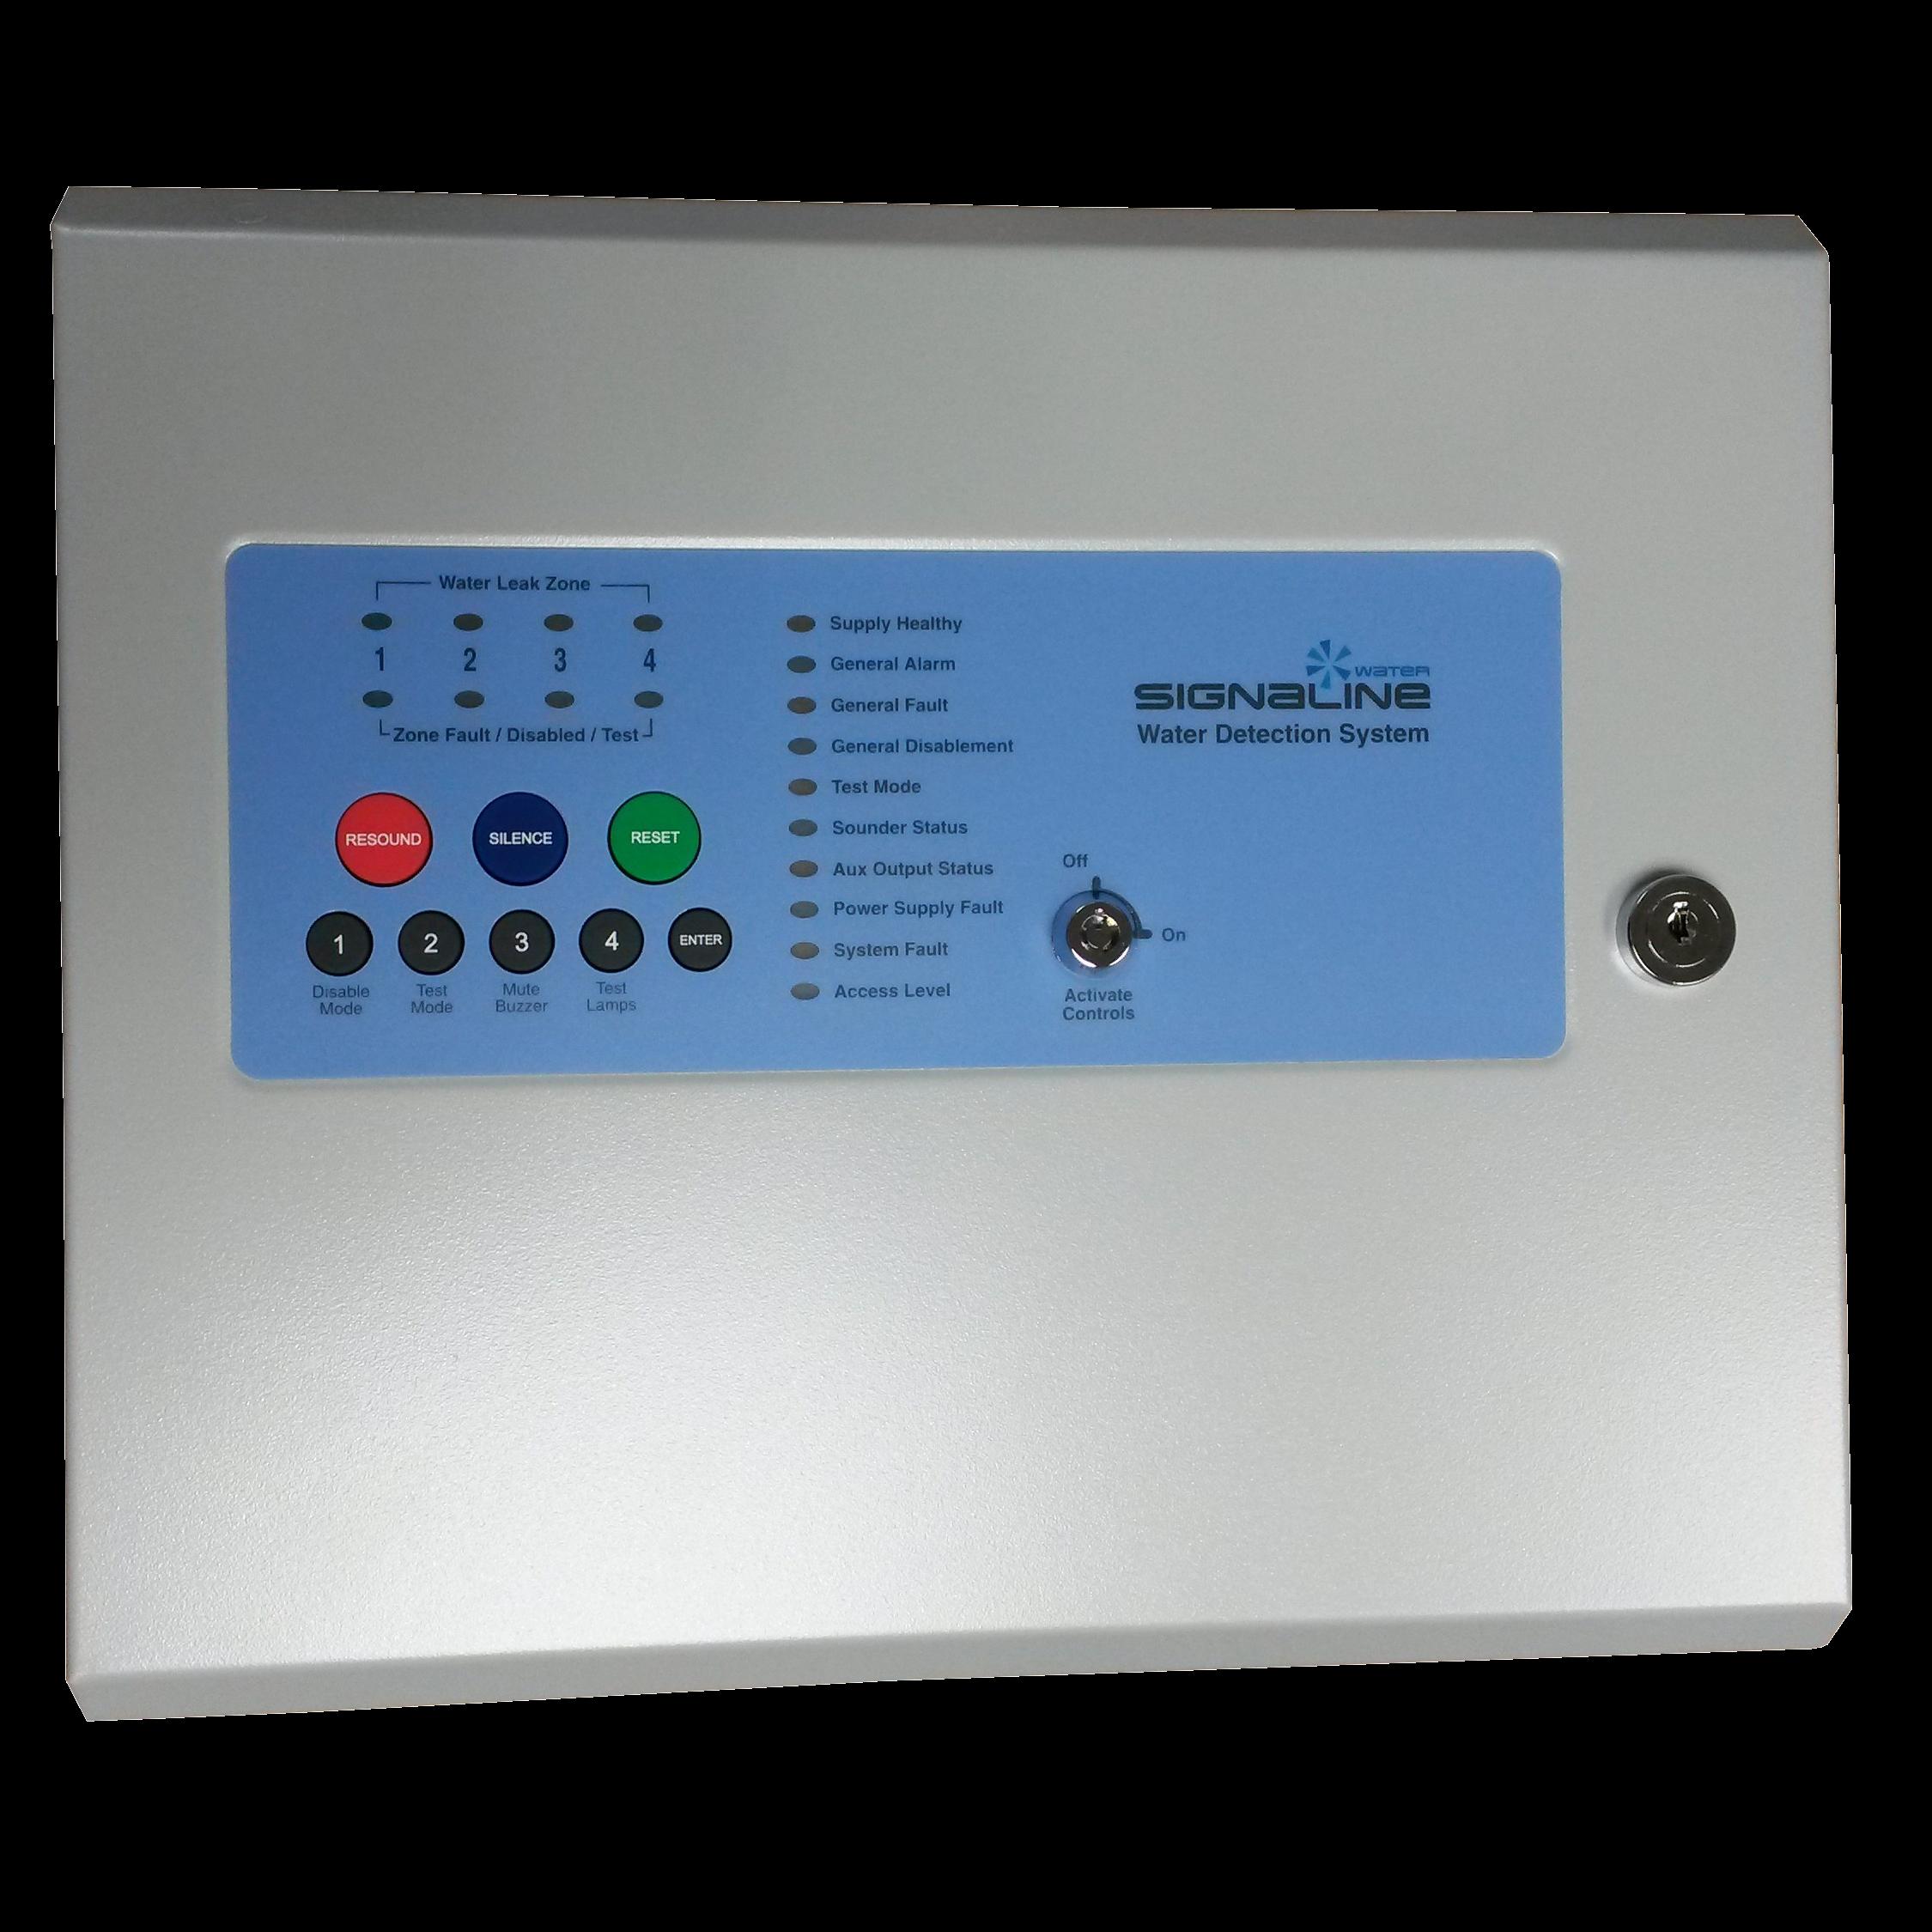 signaline-water-panel